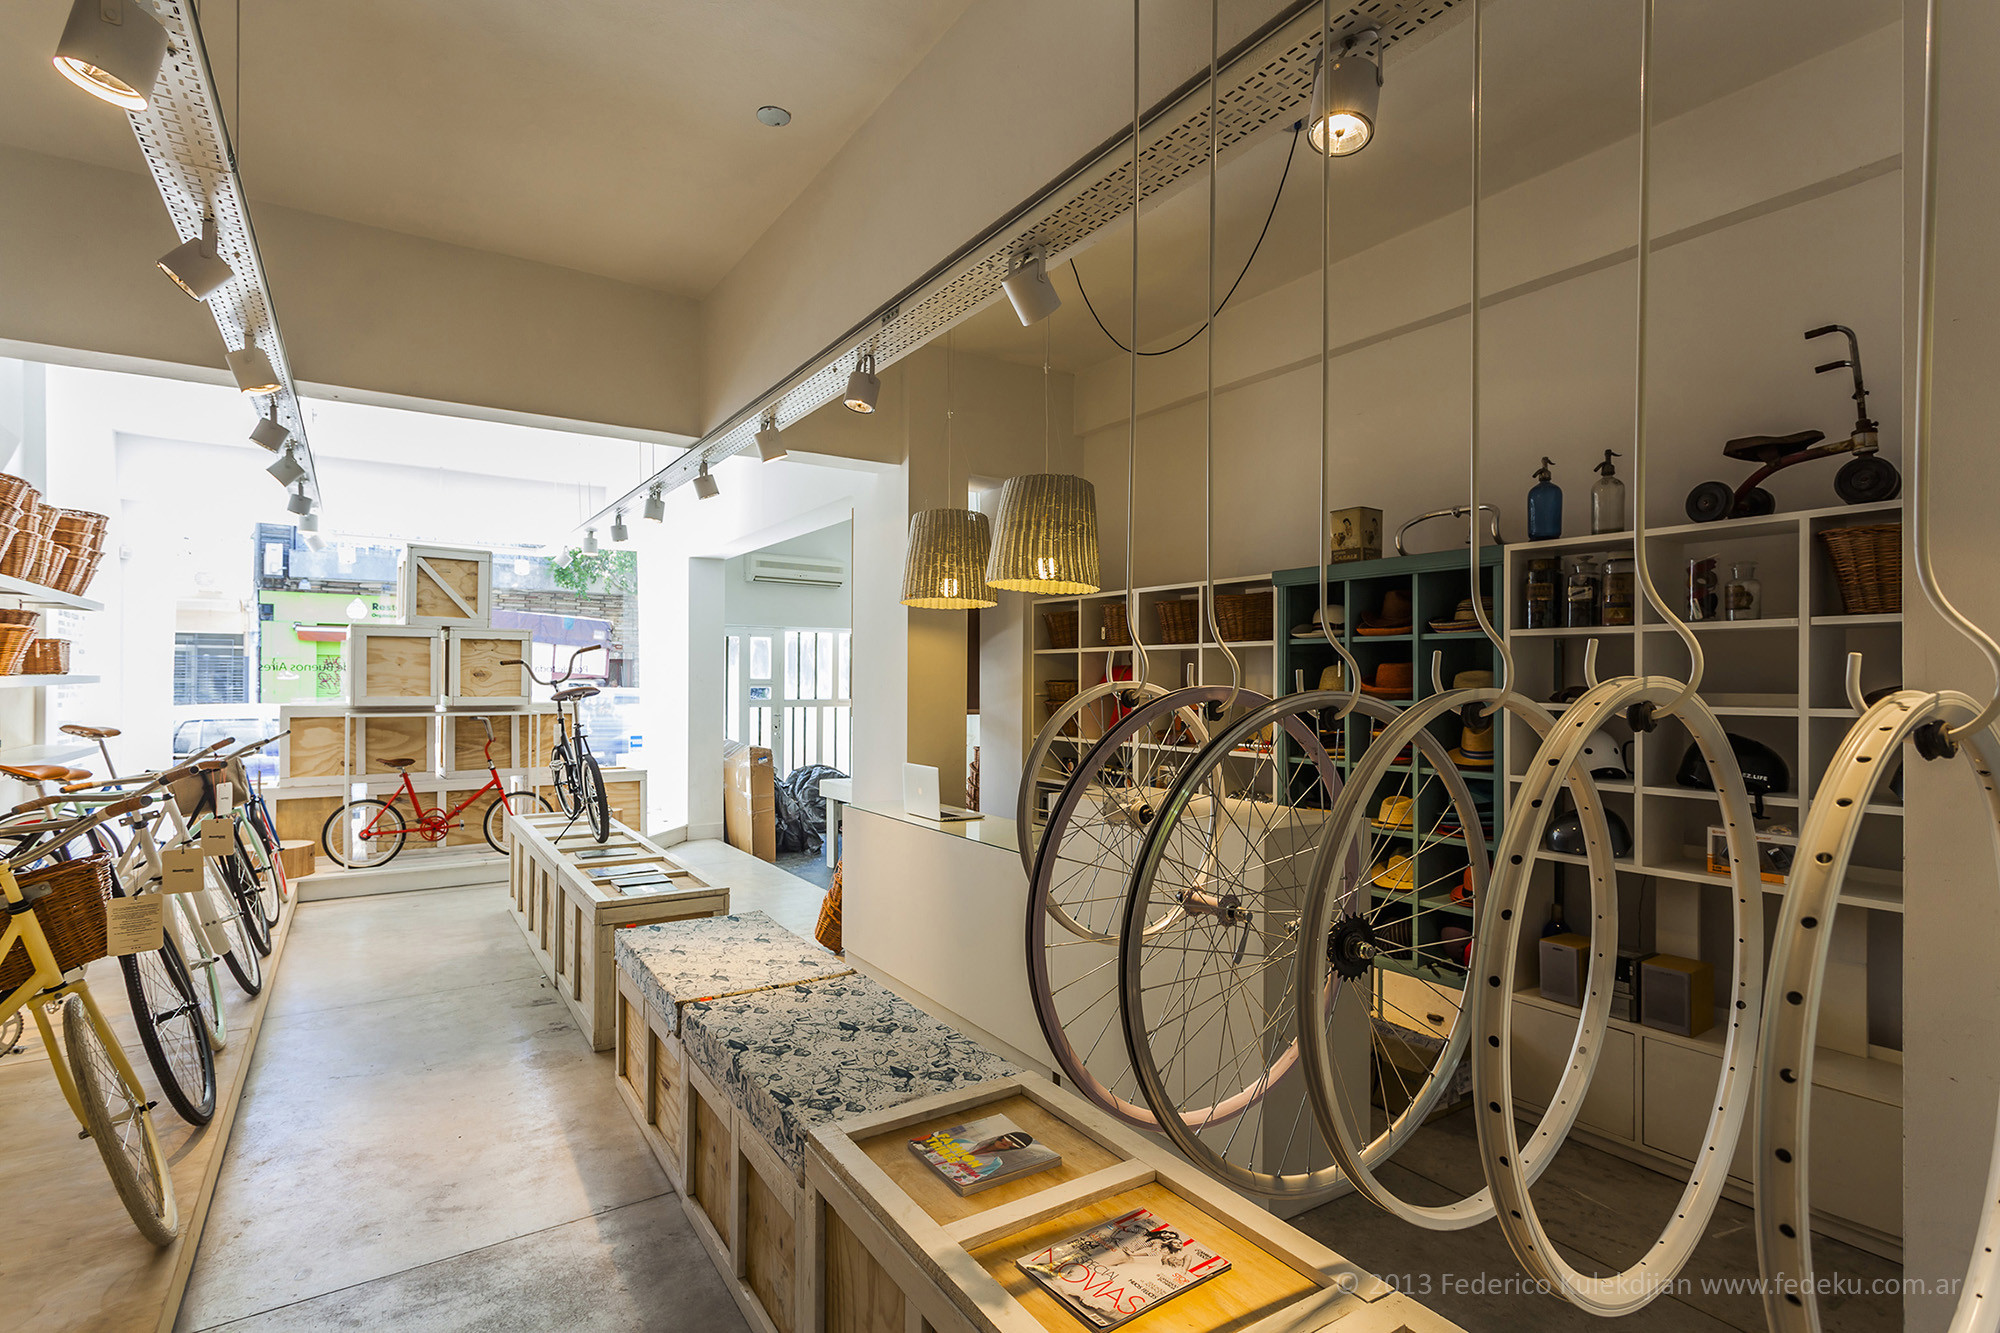 Galer a de monochrome bikes nidolab 5 - Decoracion de interiores vintage ...